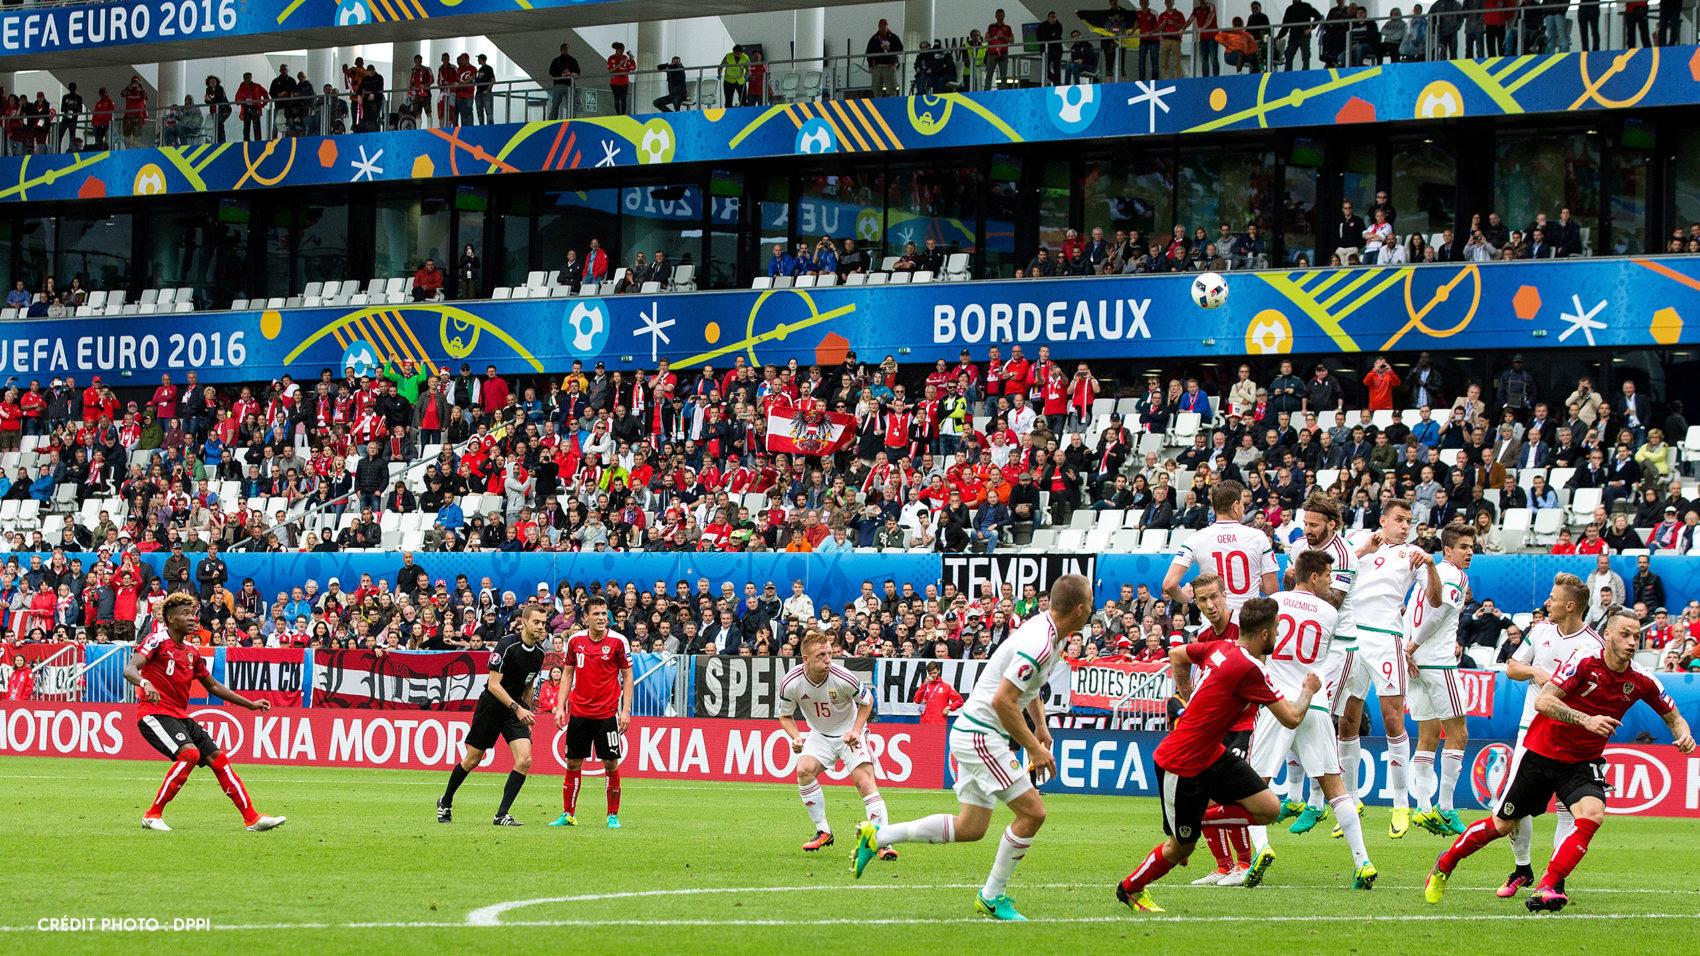 Projet_project_realisation_03_UEFA_euro_2016